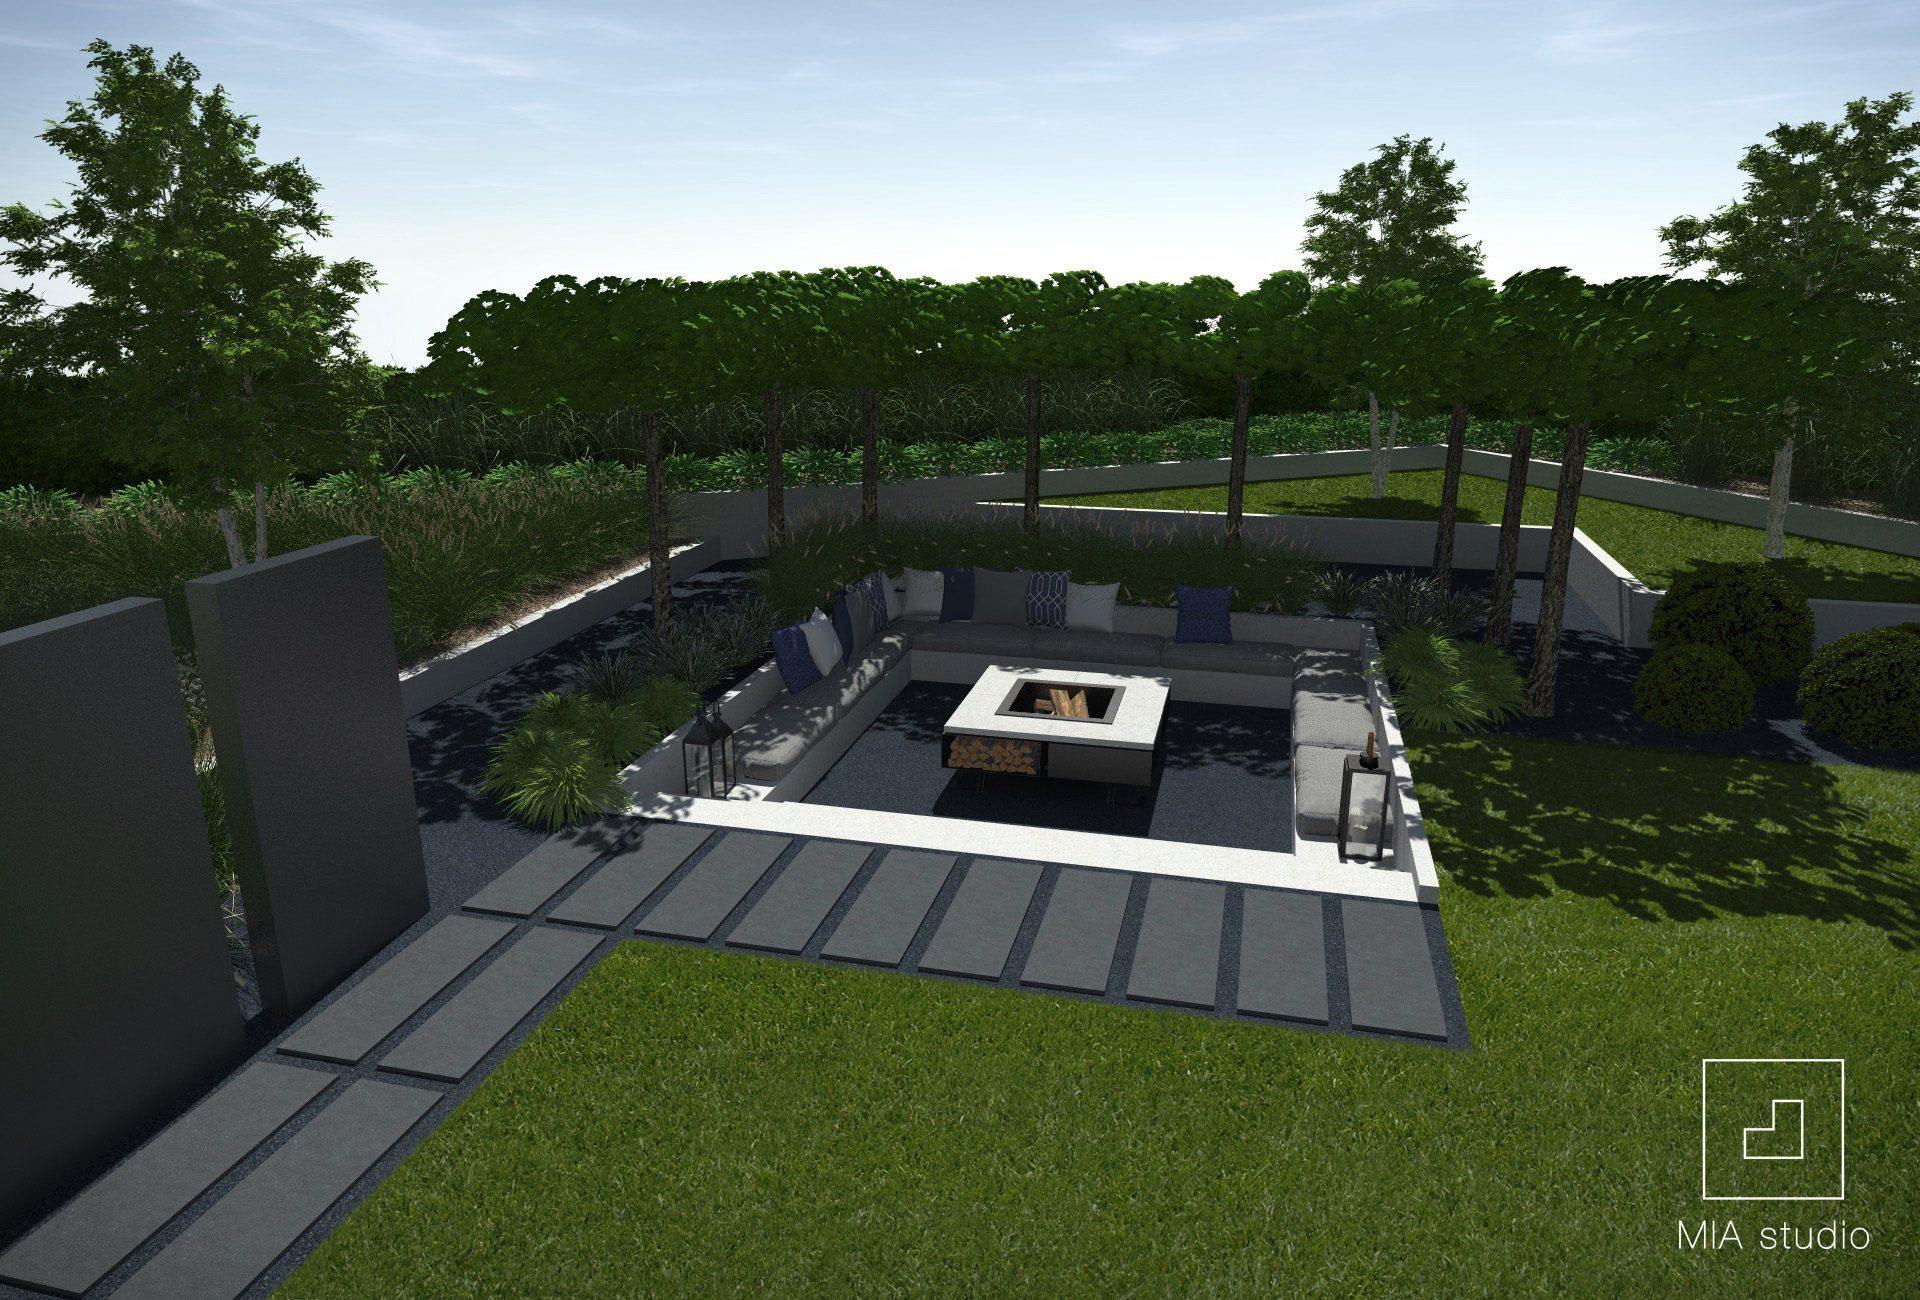 ogród z paleniskiem